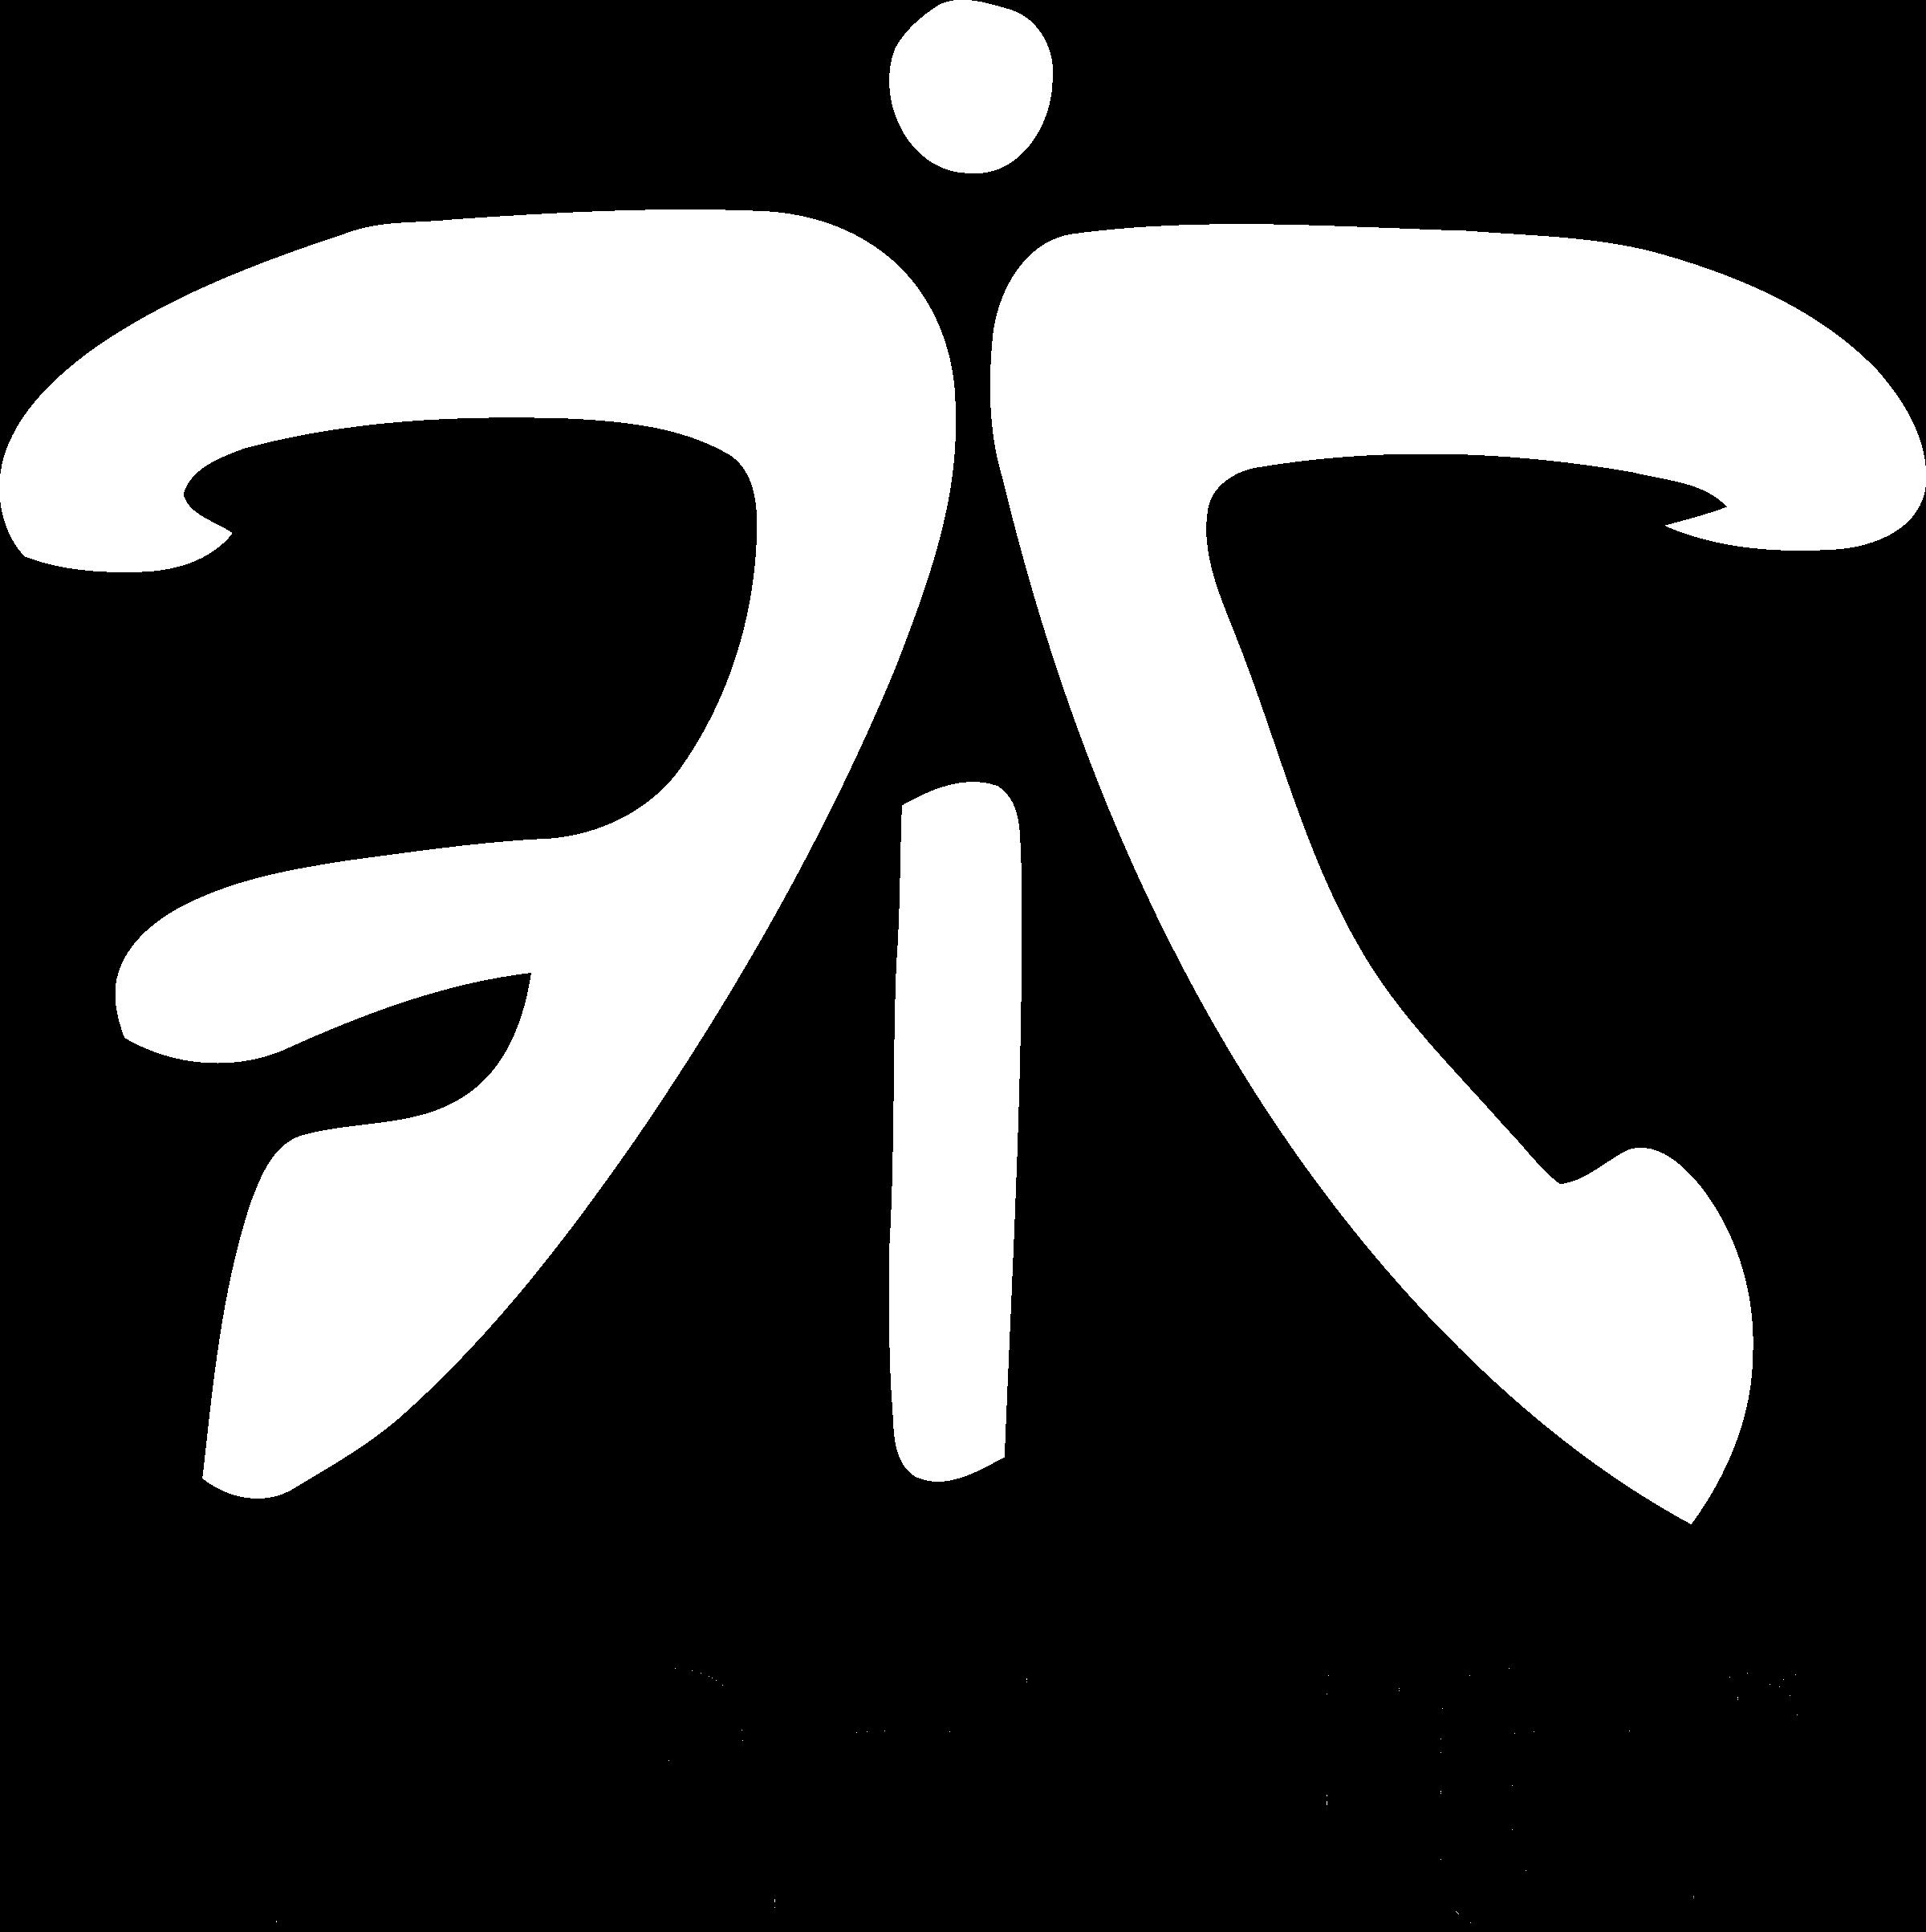 Fnatic Logo Black And White Fnatic.